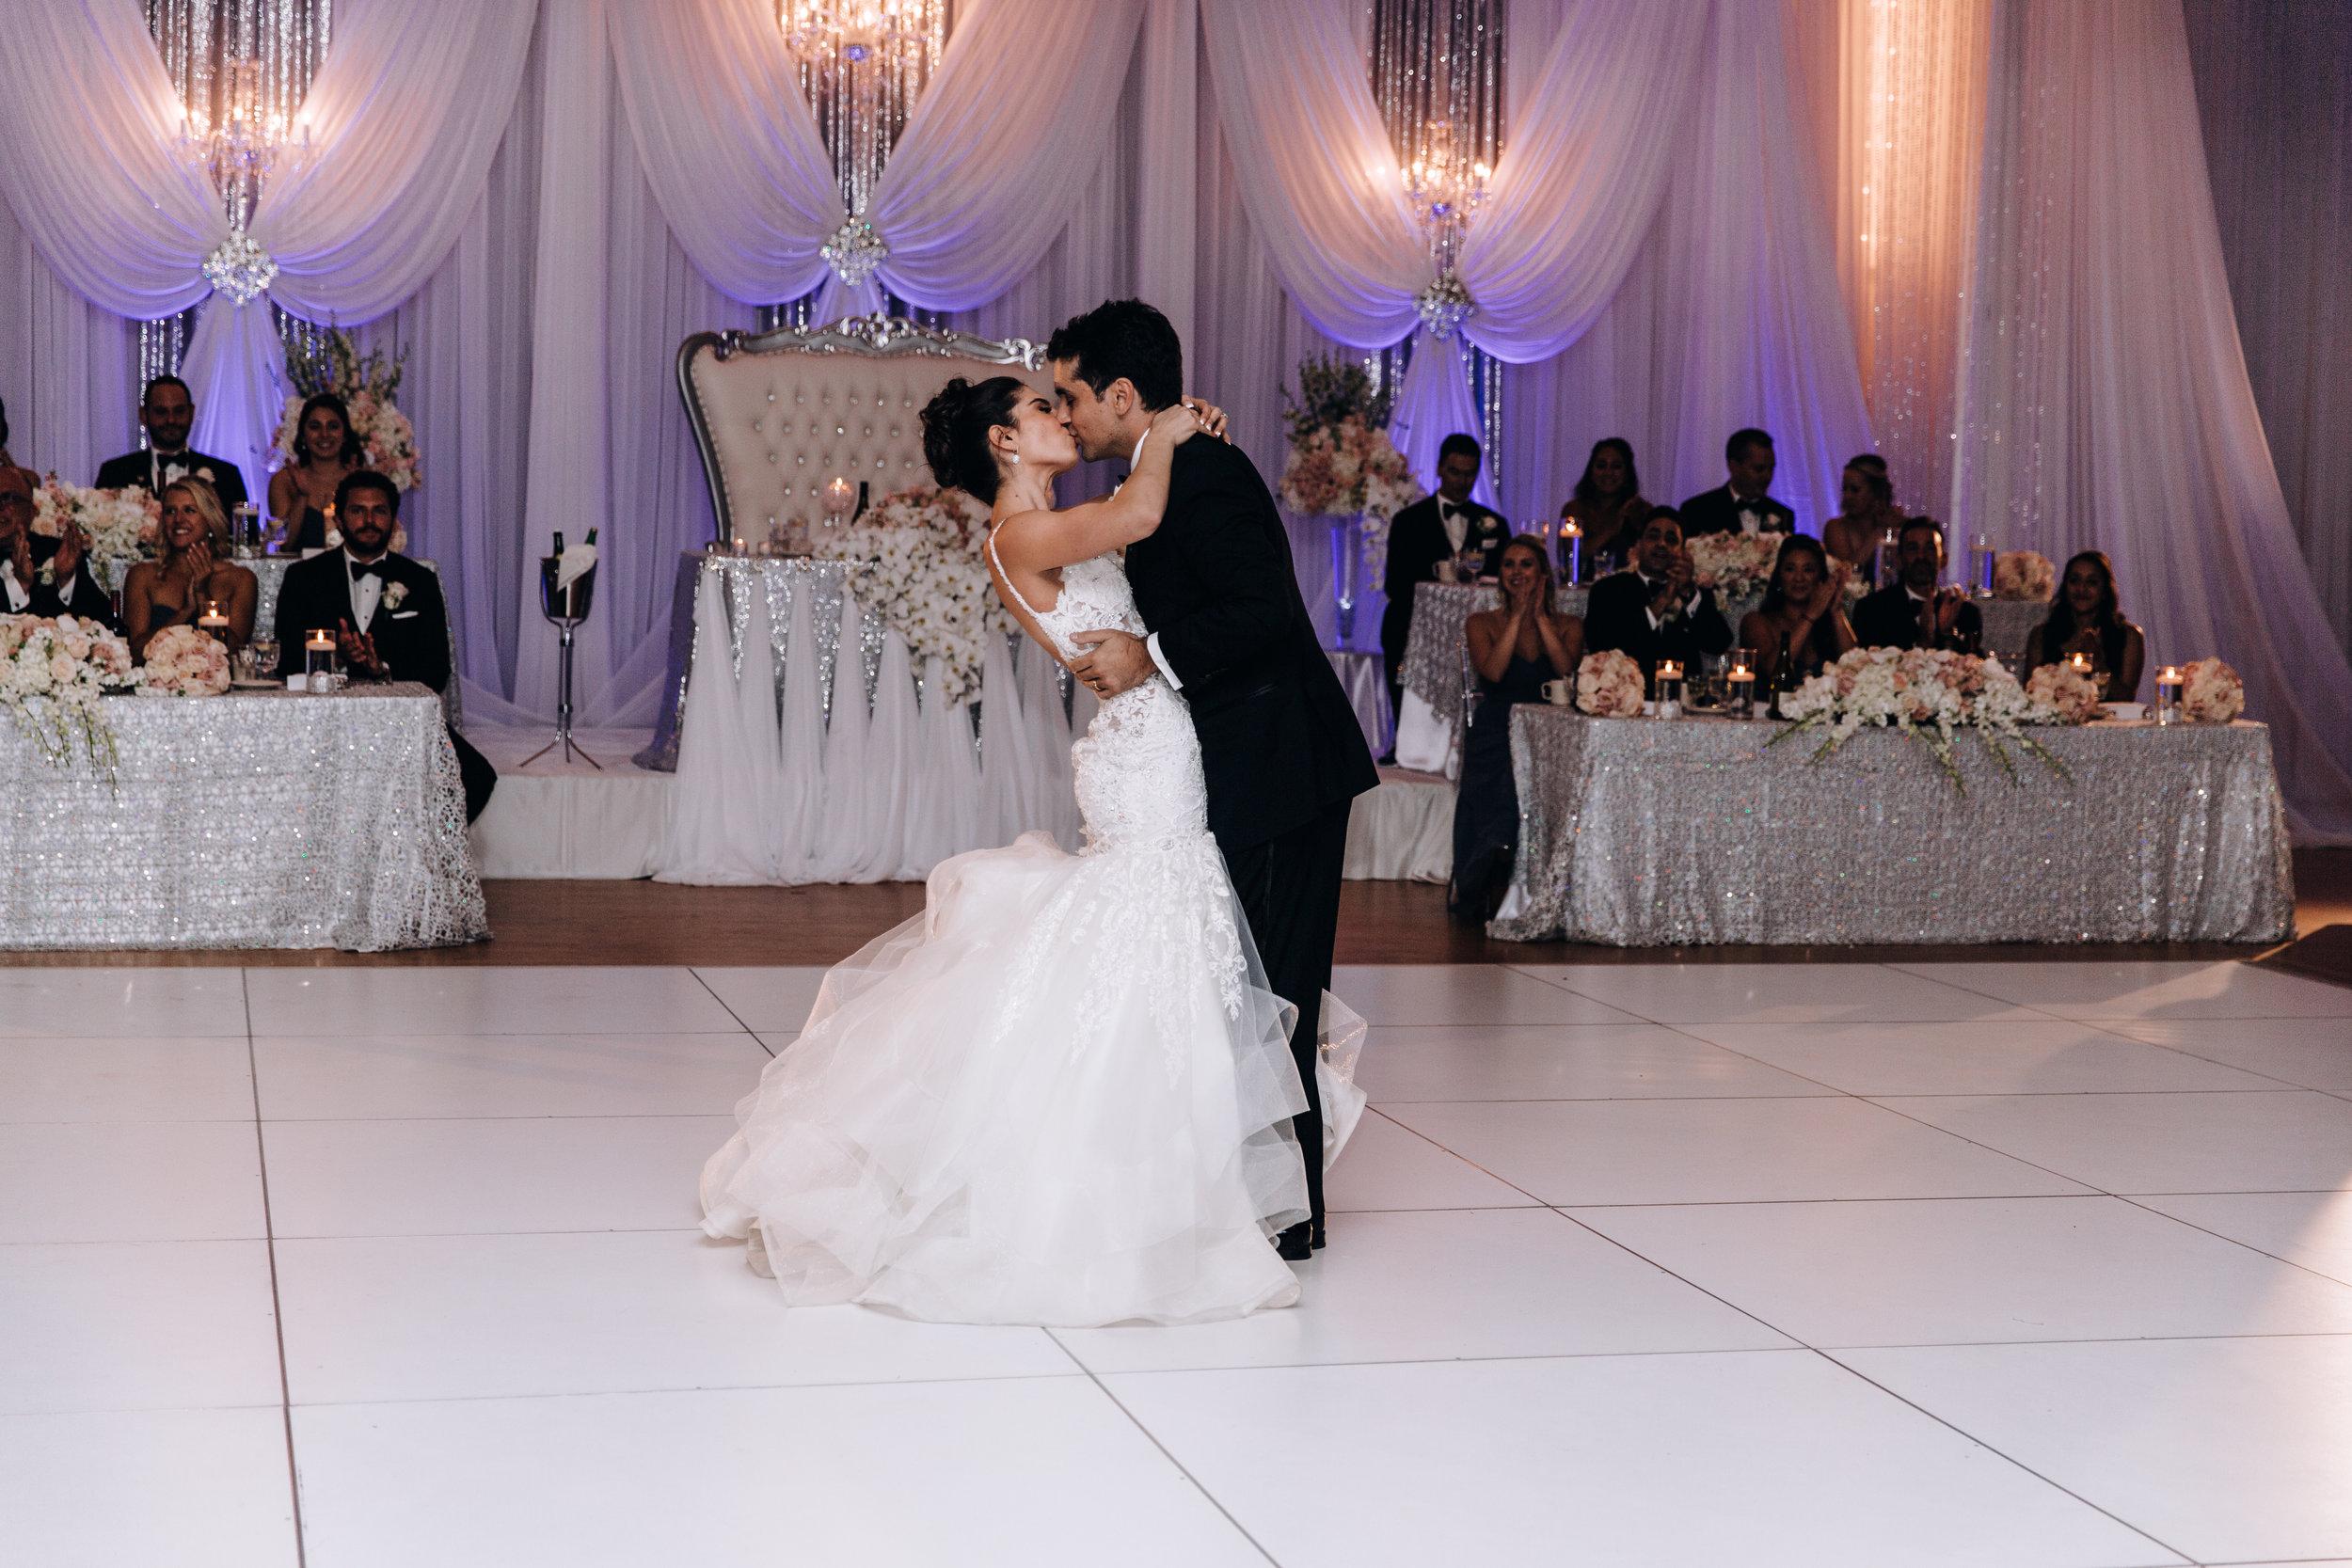 KaraNixonWeddings-GreekOrthodox-Oakland-Wedding-35.jpg